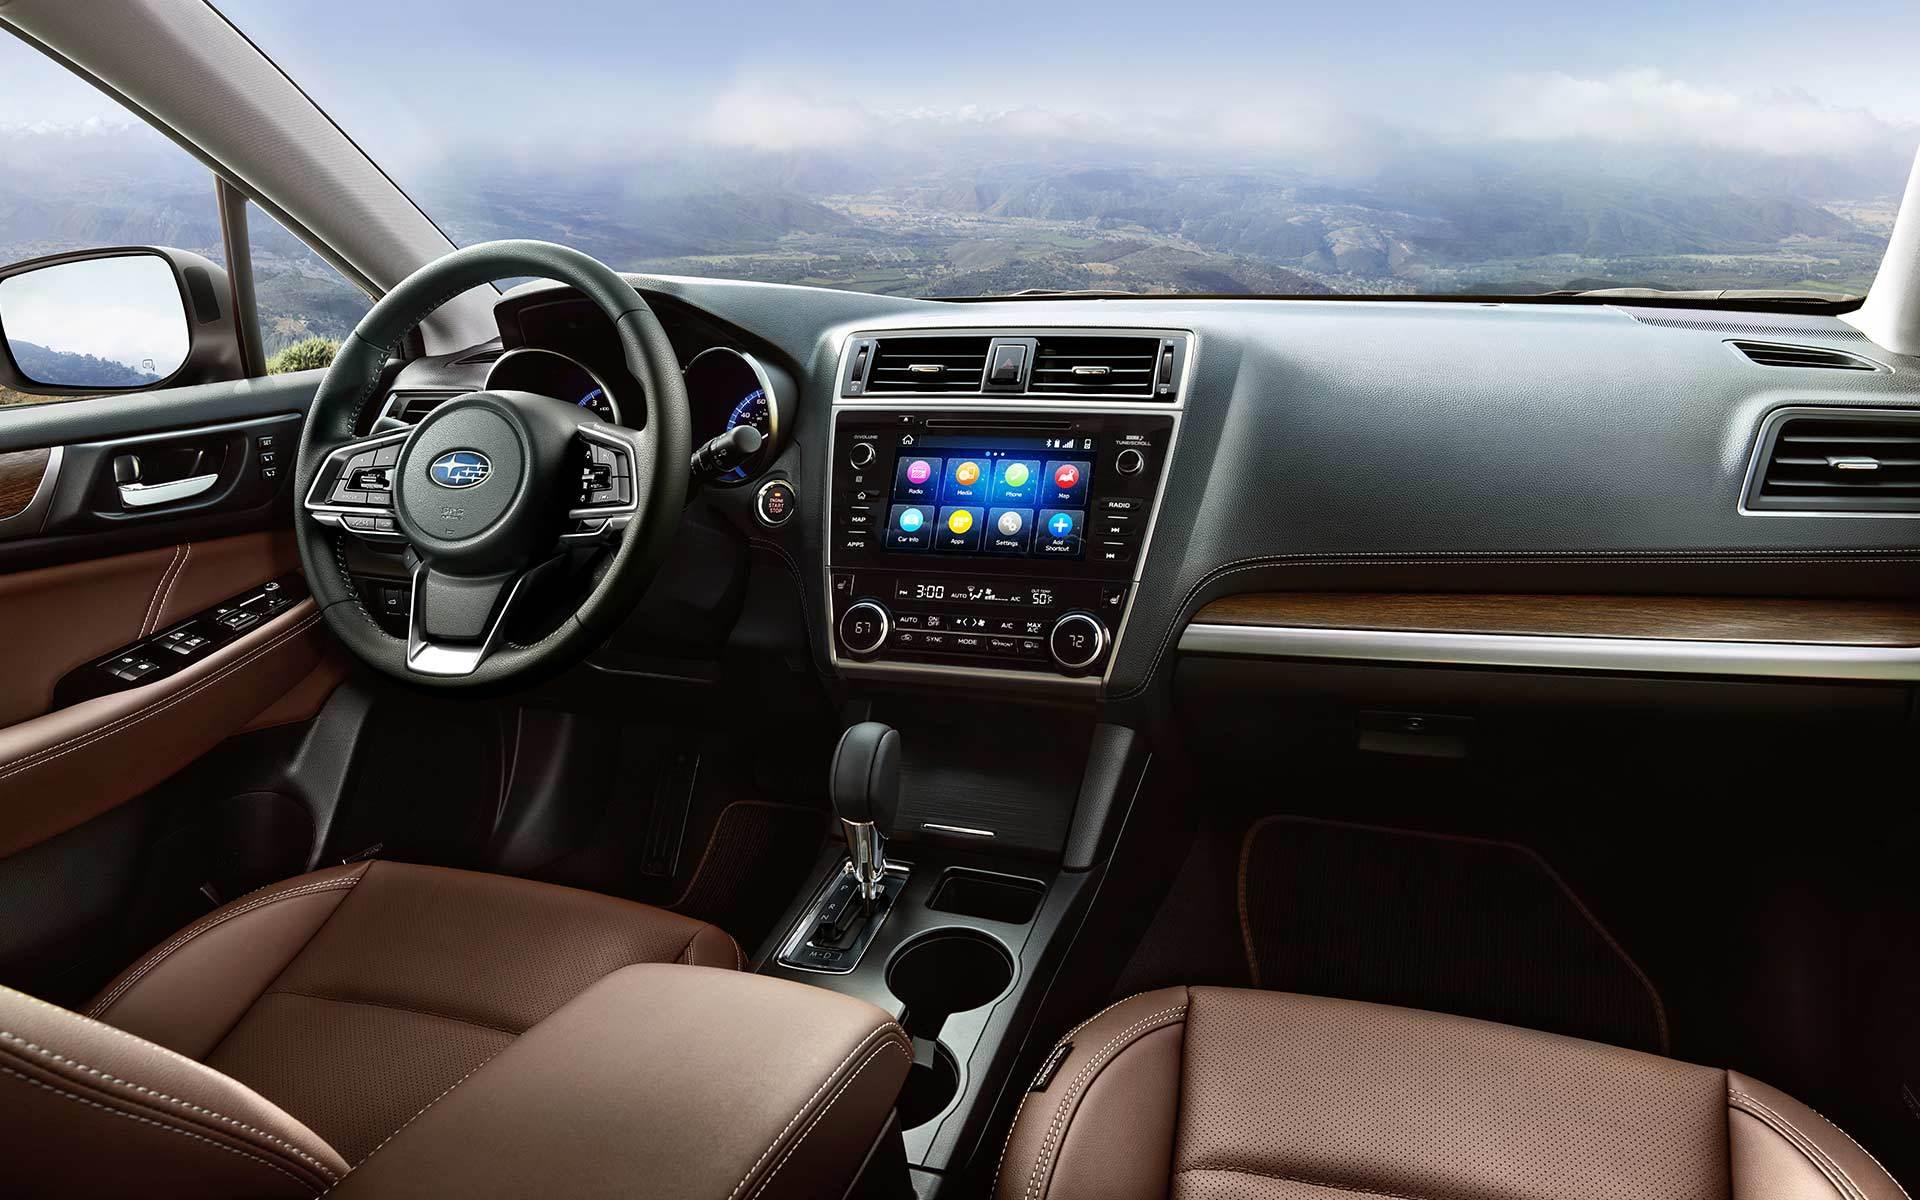 2019 Subaru Outback Offers EyeSight Driver Assist Tech In